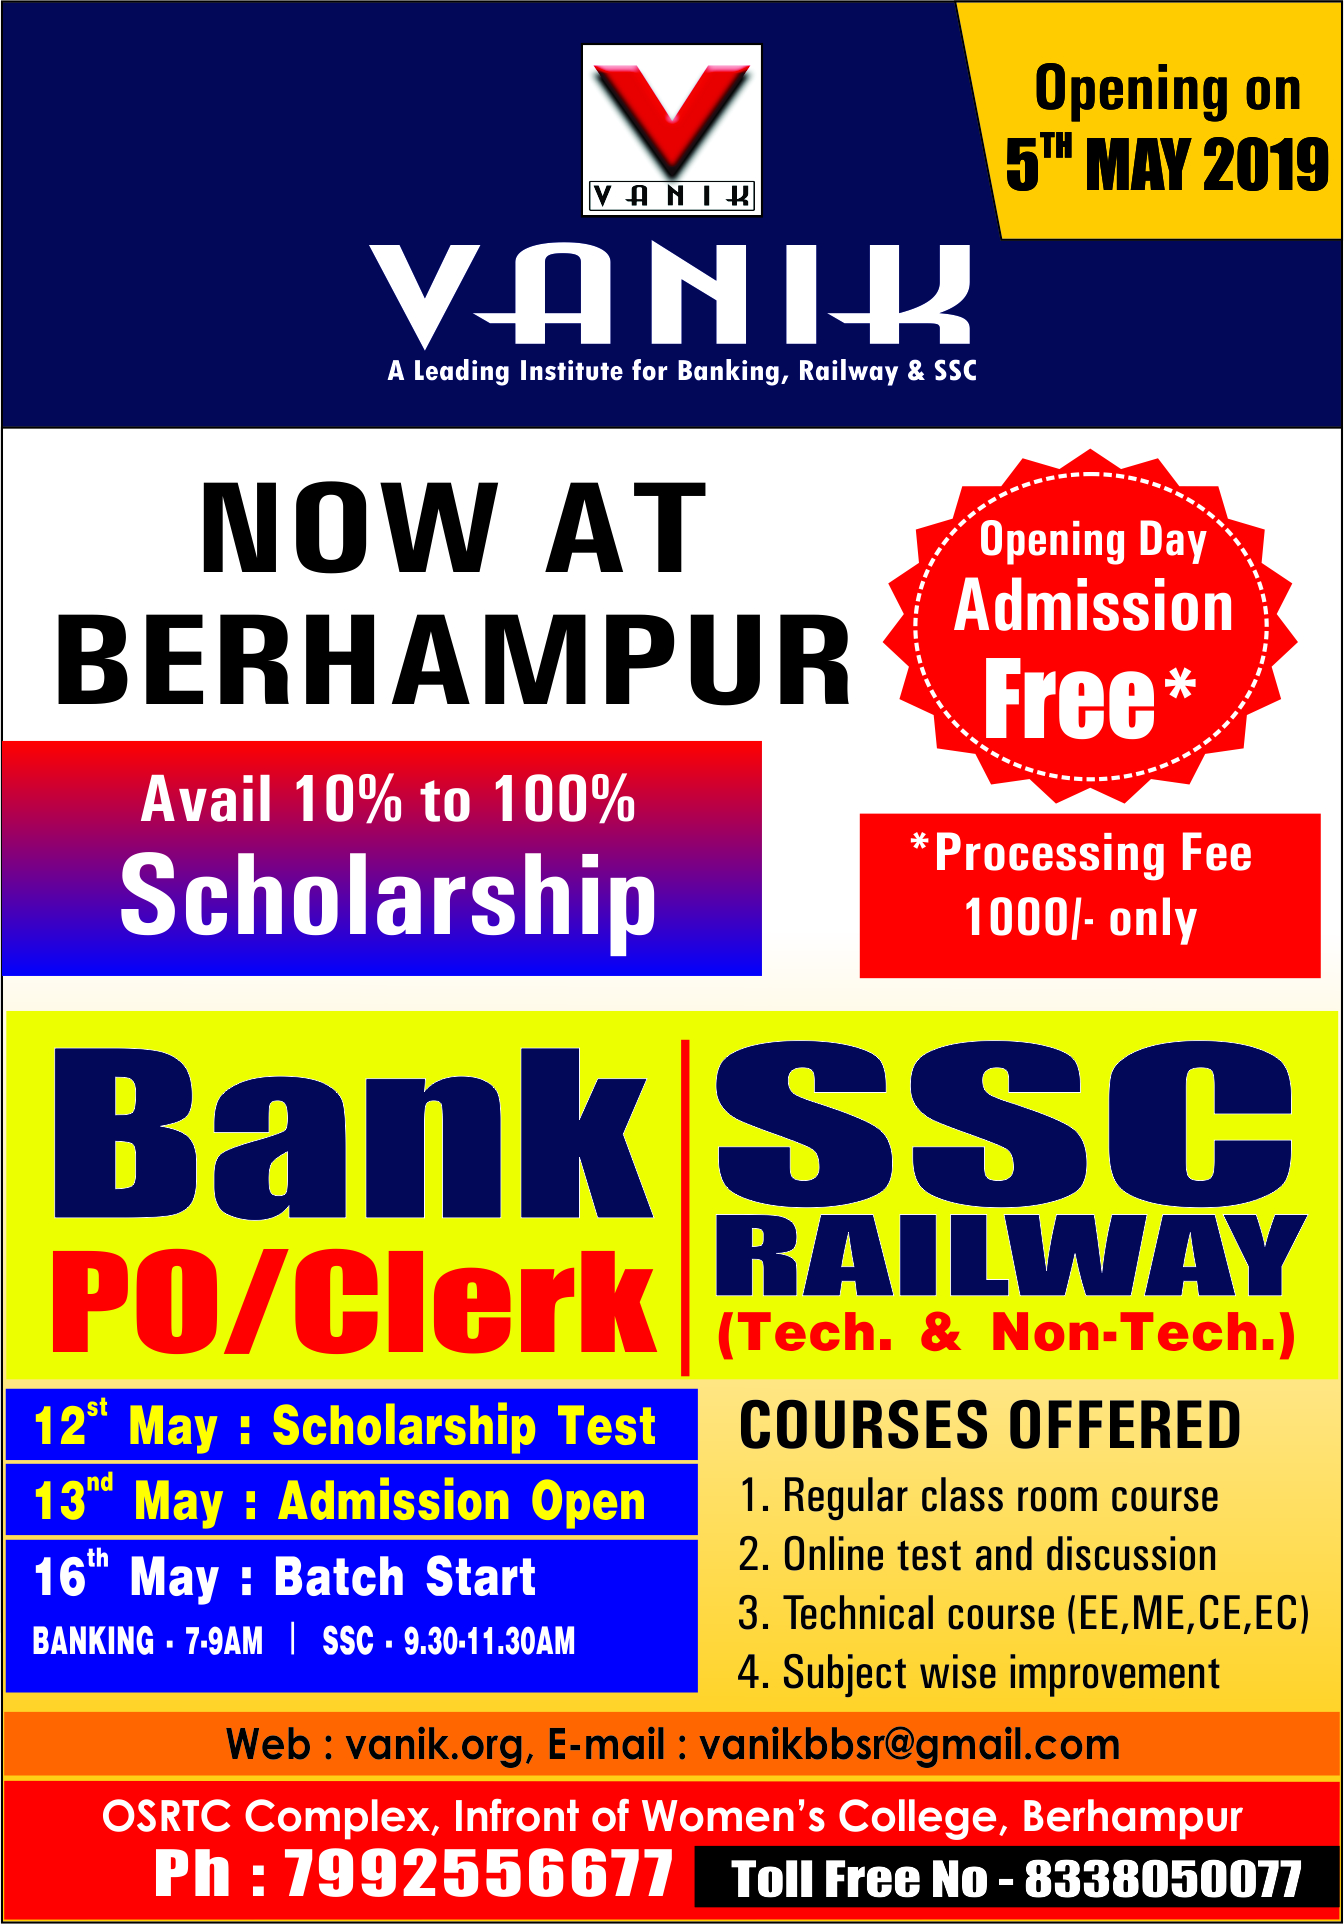 Vanik : Banking Coaching Institute in Bhubaneswar, Odisha